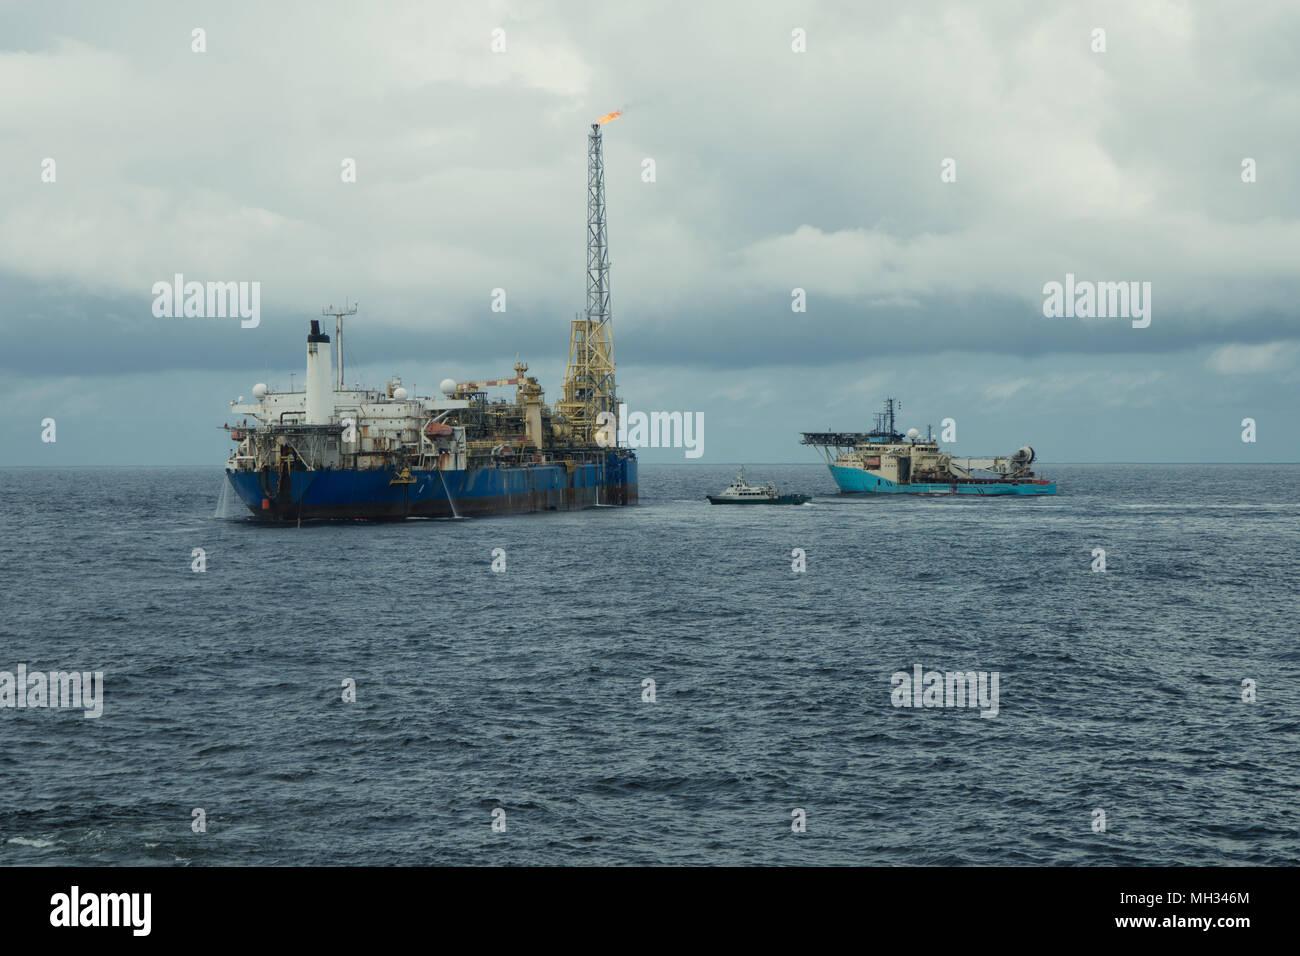 Fpso Ship Stock Photos & Fpso Ship Stock Images - Alamy